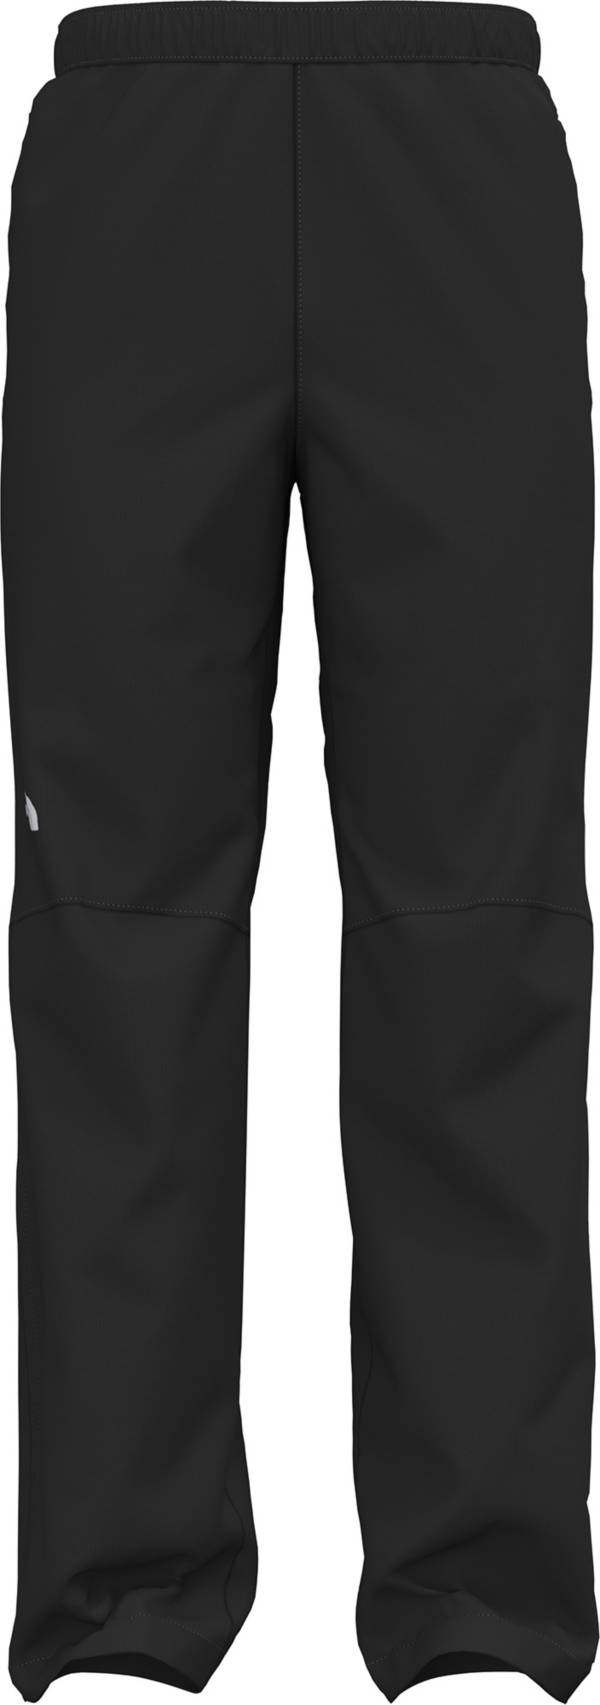 The North Face Men's Venture 2 Half Zip Pants product image